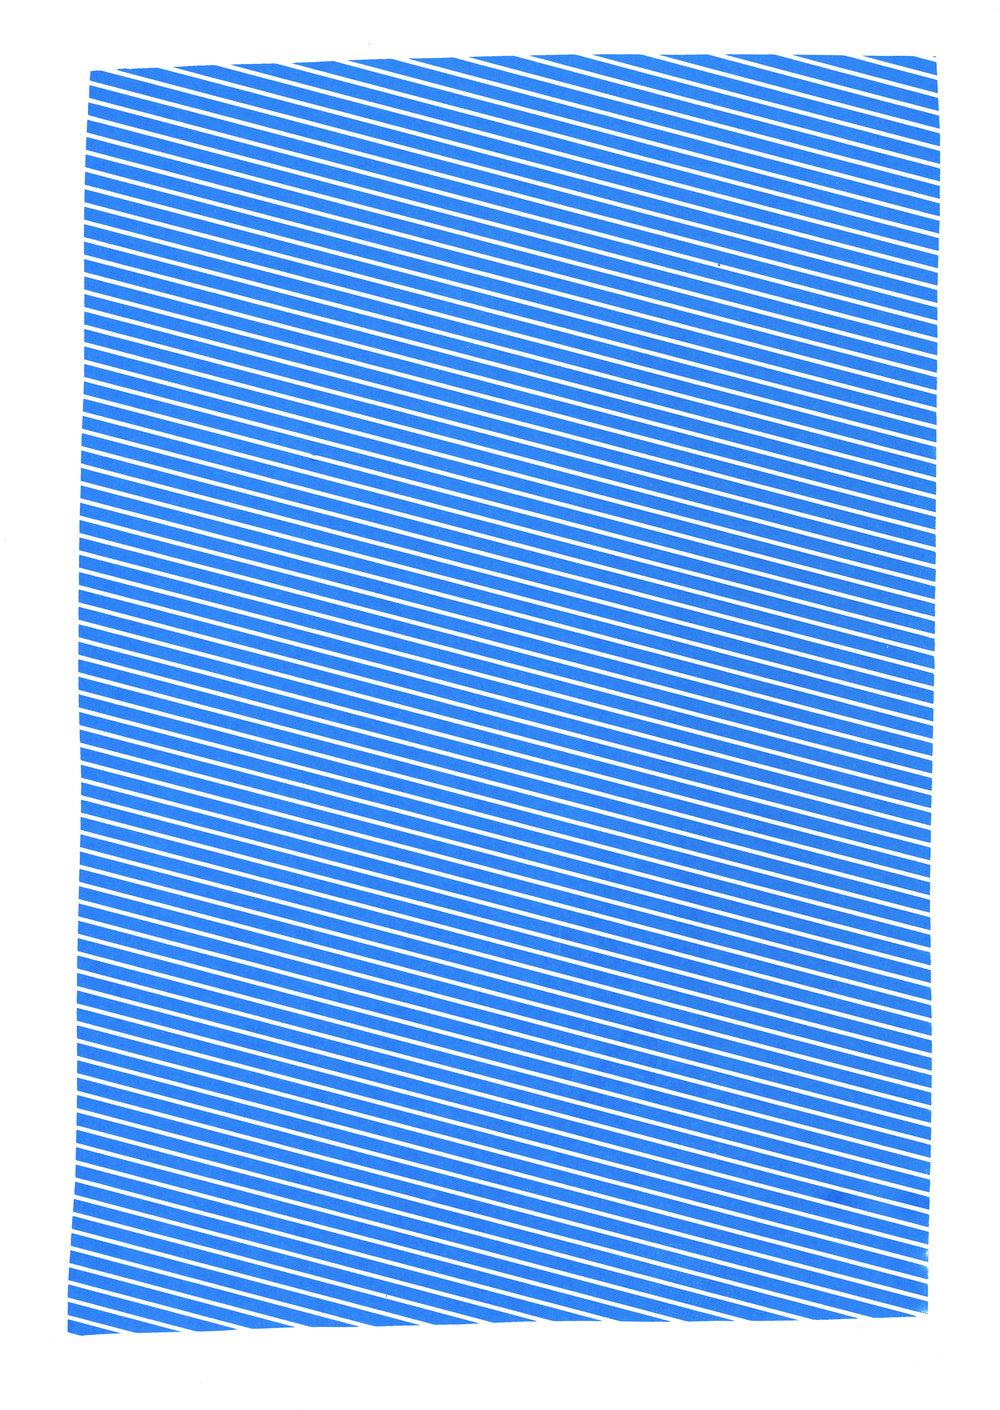 "Cyan study,2017, silkscreen, 19"" x 12.5"""